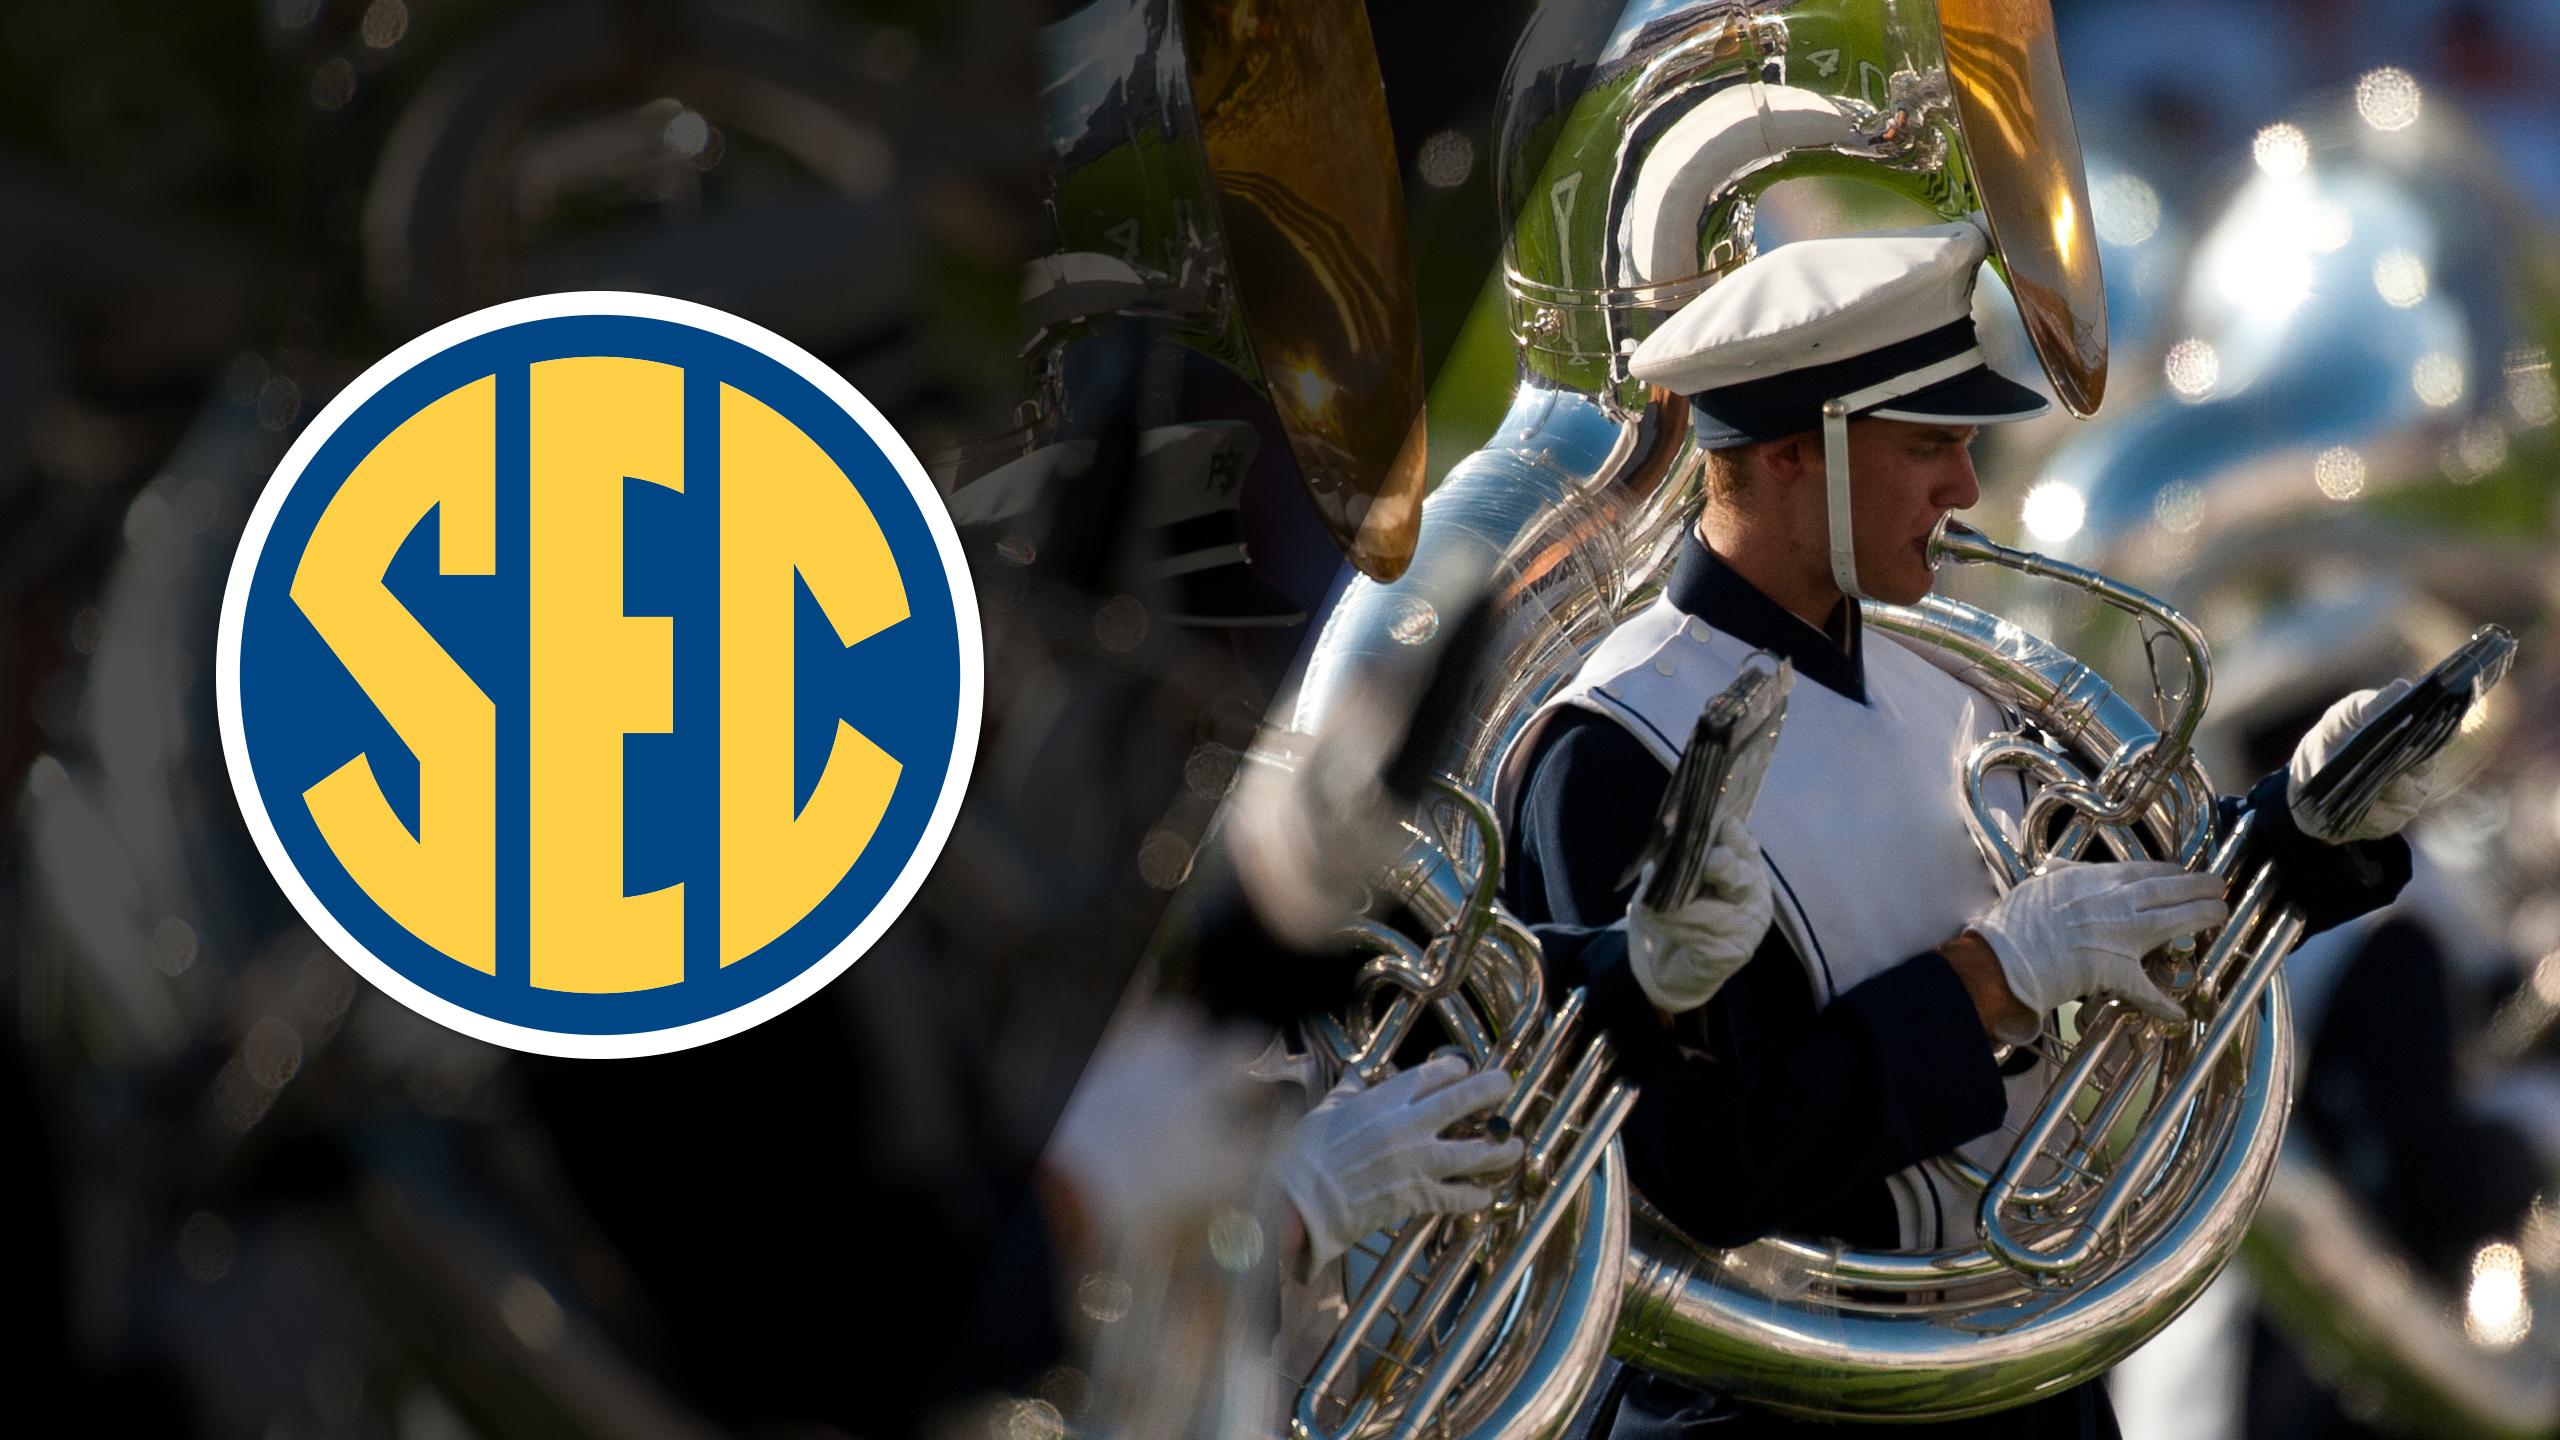 SEC Halftime Band Performances at Alabama